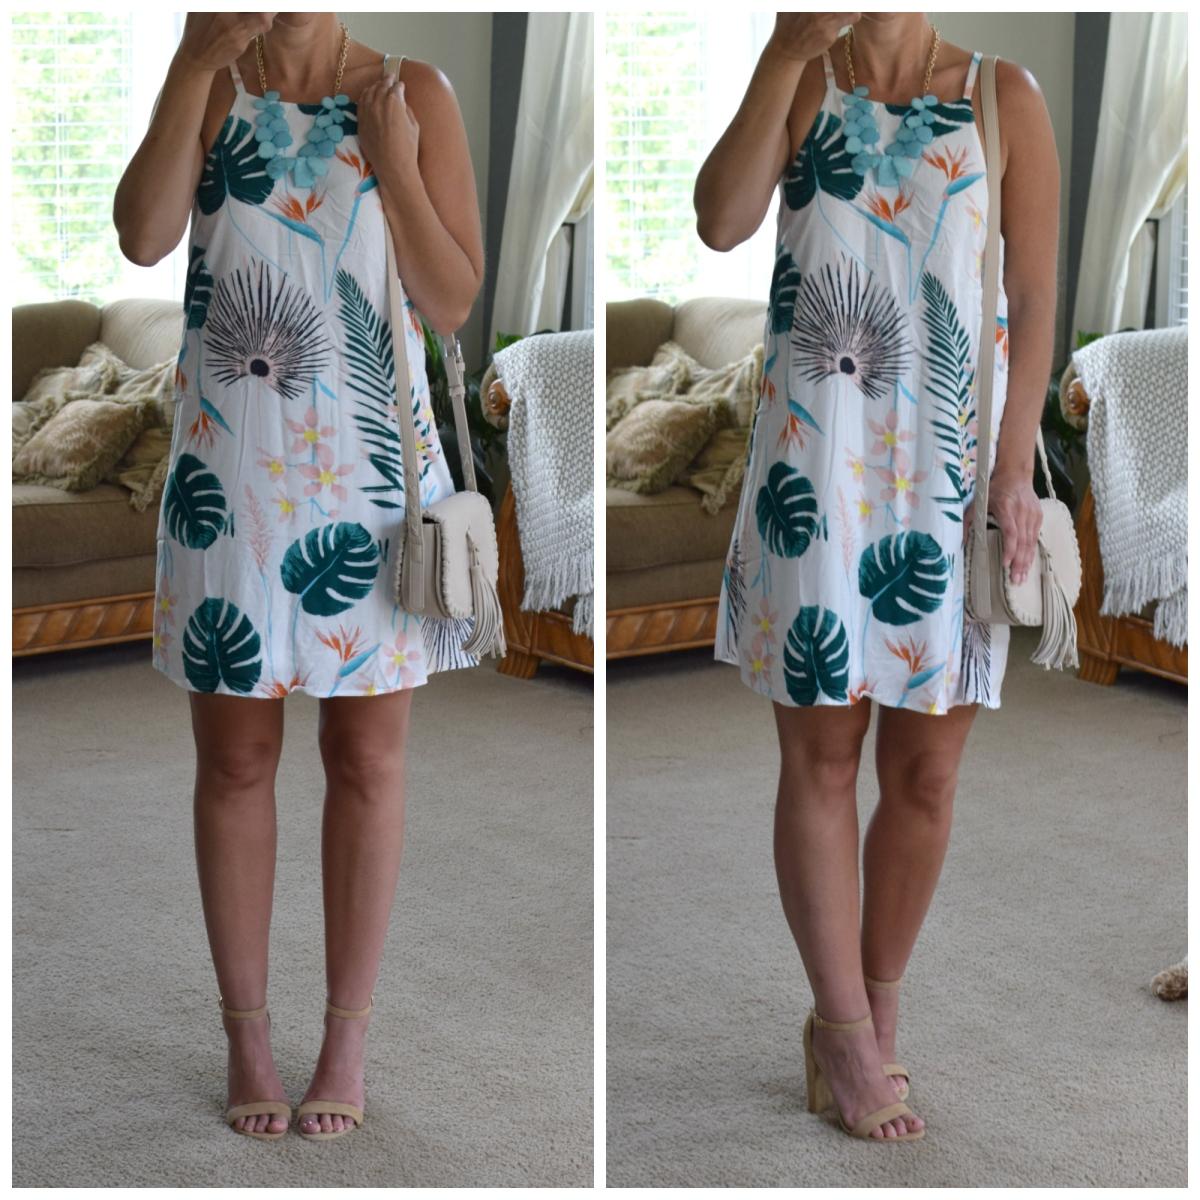 Beachy palm print dress |www.pearlsandsportsbras.com|